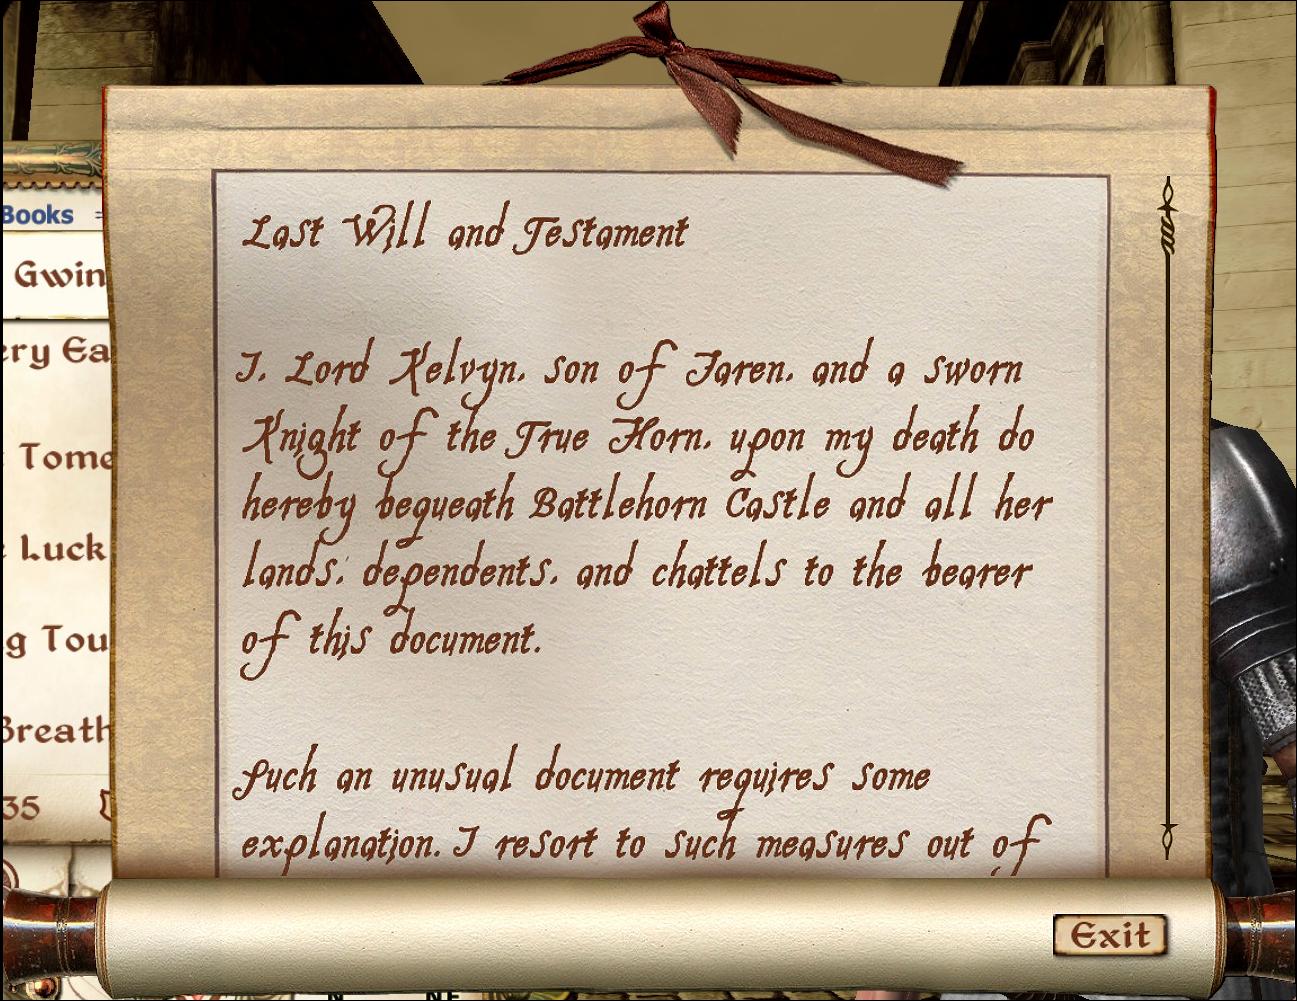 Lord Kelvyn's Last Will and Testament